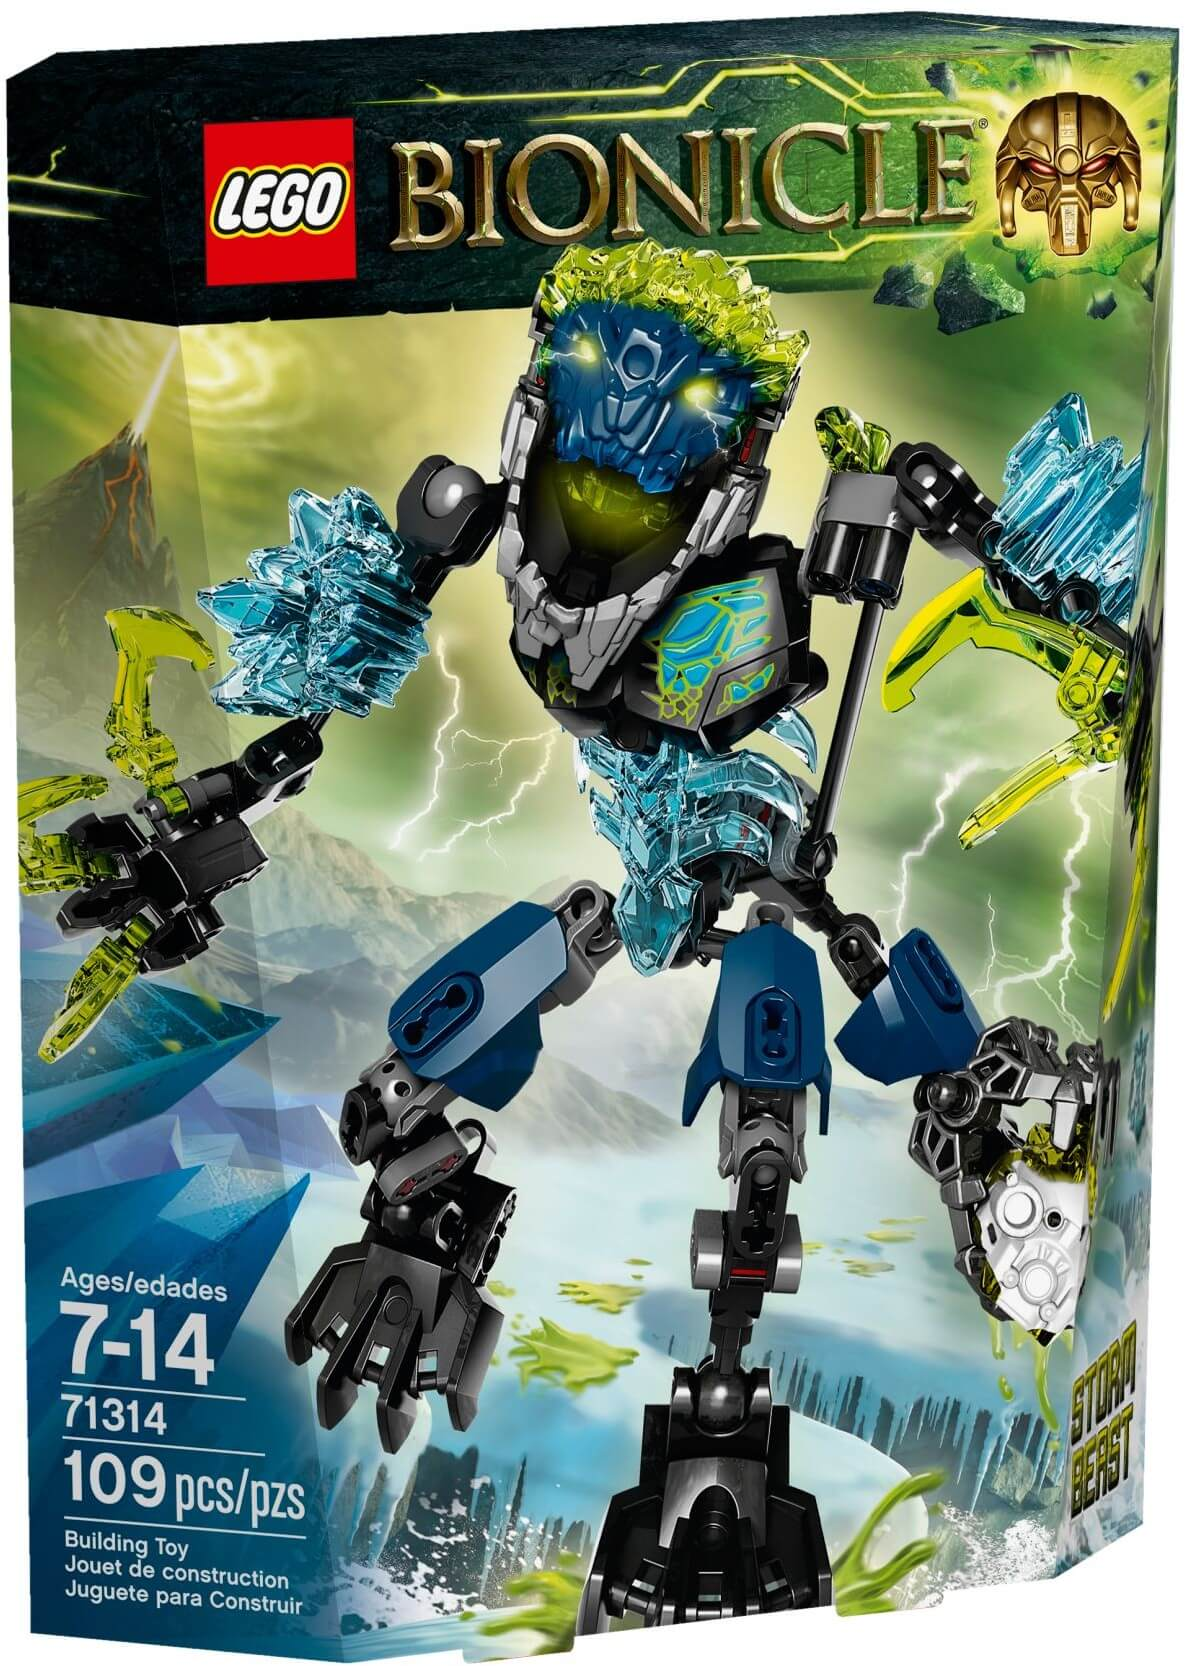 Mua đồ chơi LEGO 71314 - LEGO BIONICLE 71314 - Quái Vật Bão Tố (LEGO BIONICLE Storm Beast 71314)